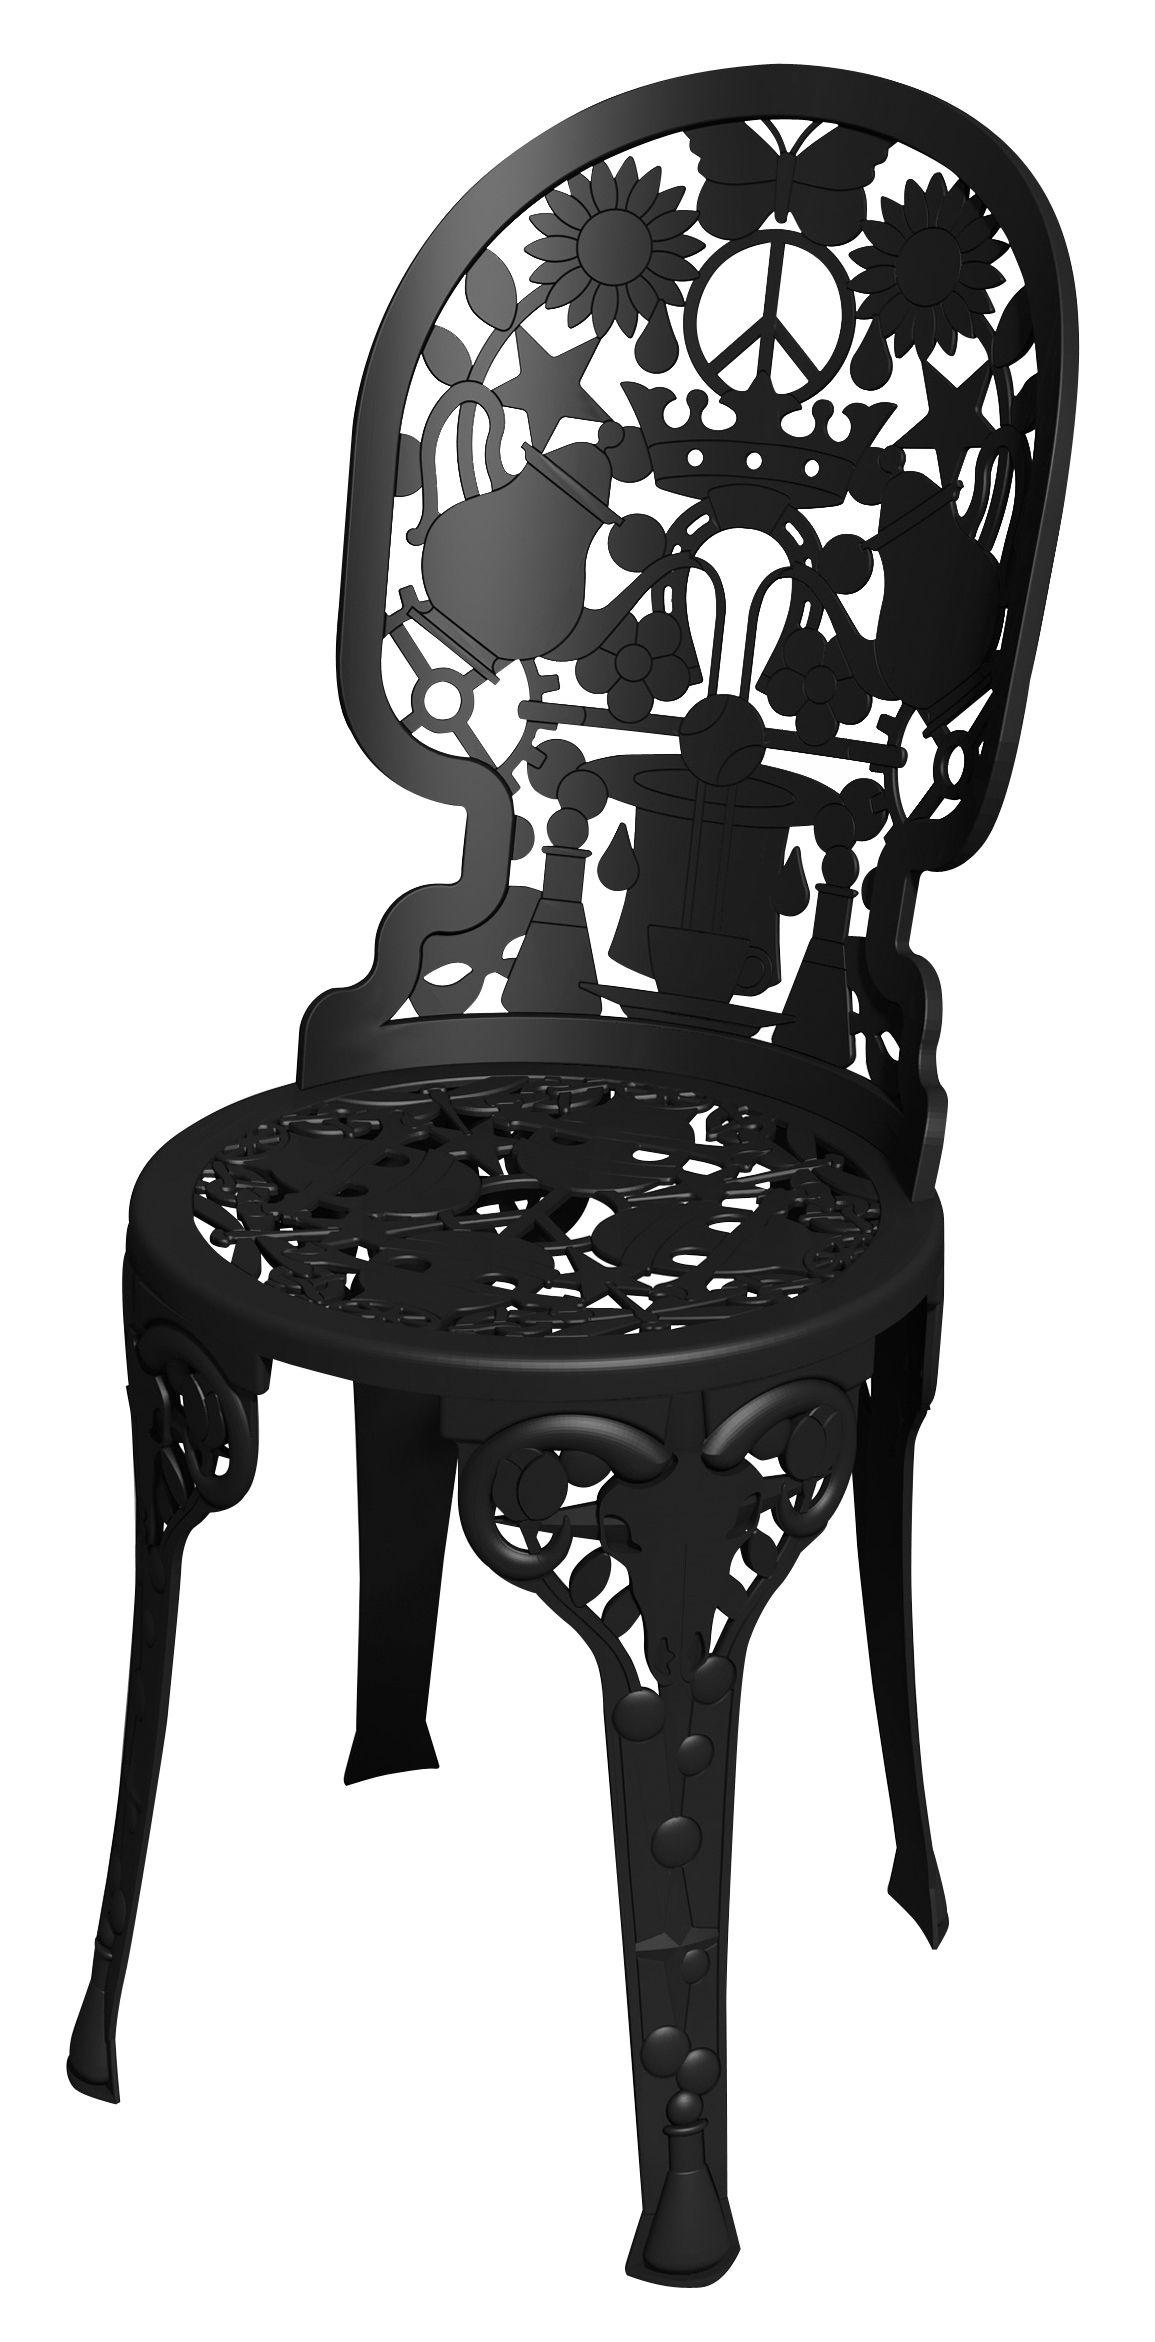 Mobilier - Chaises, fauteuils de salle à manger - Chaise Industry Garden - Seletti - Noir - Aluminium